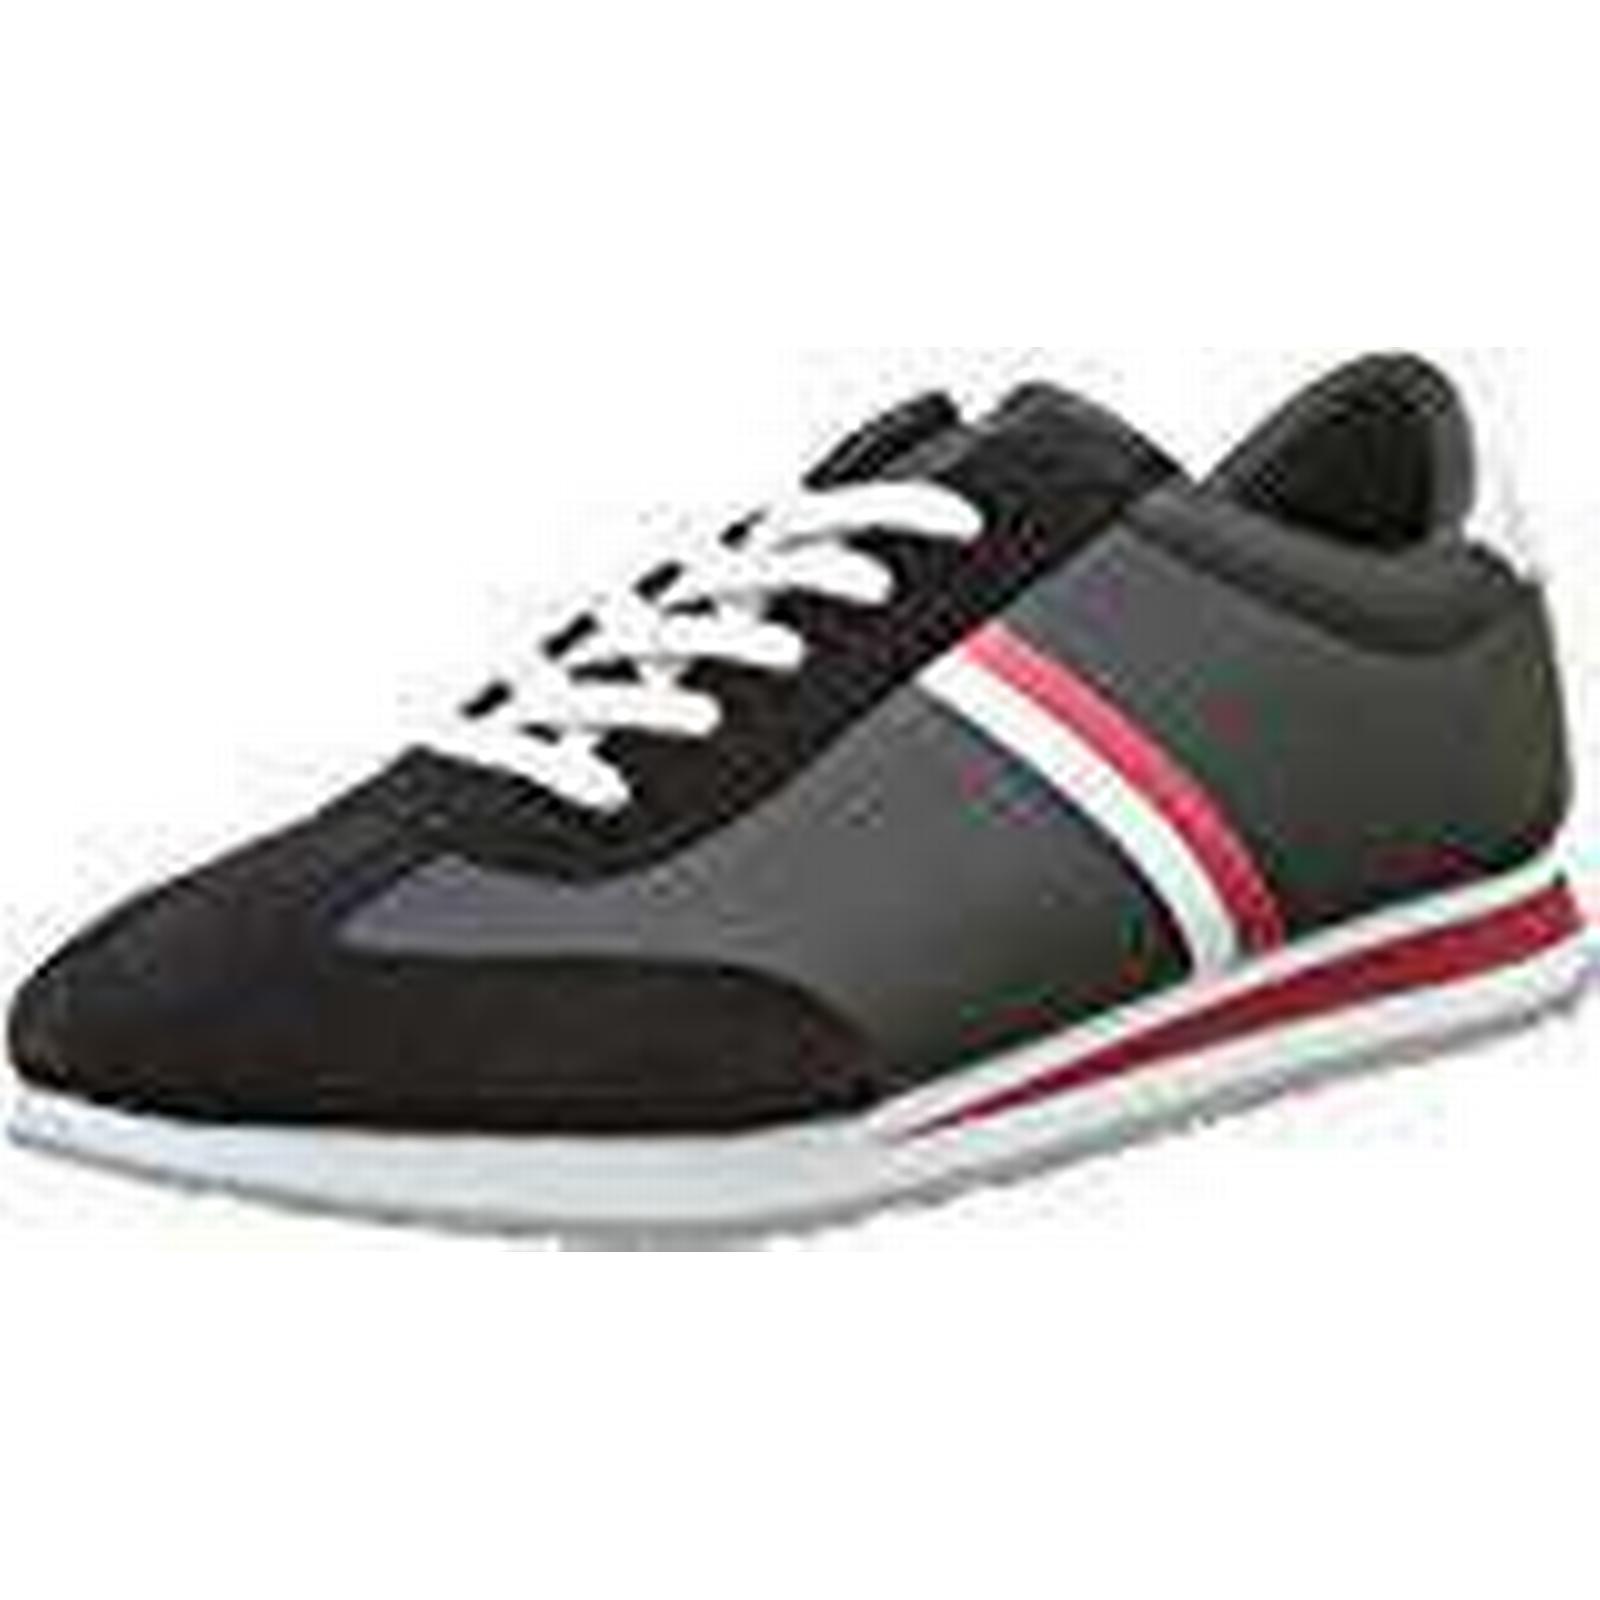 Tommy Hilfiger Men's Core Corporate 403), Sneaker Low-Top, Blue (Midnight 403), Corporate 8 UK 8 UK b17835